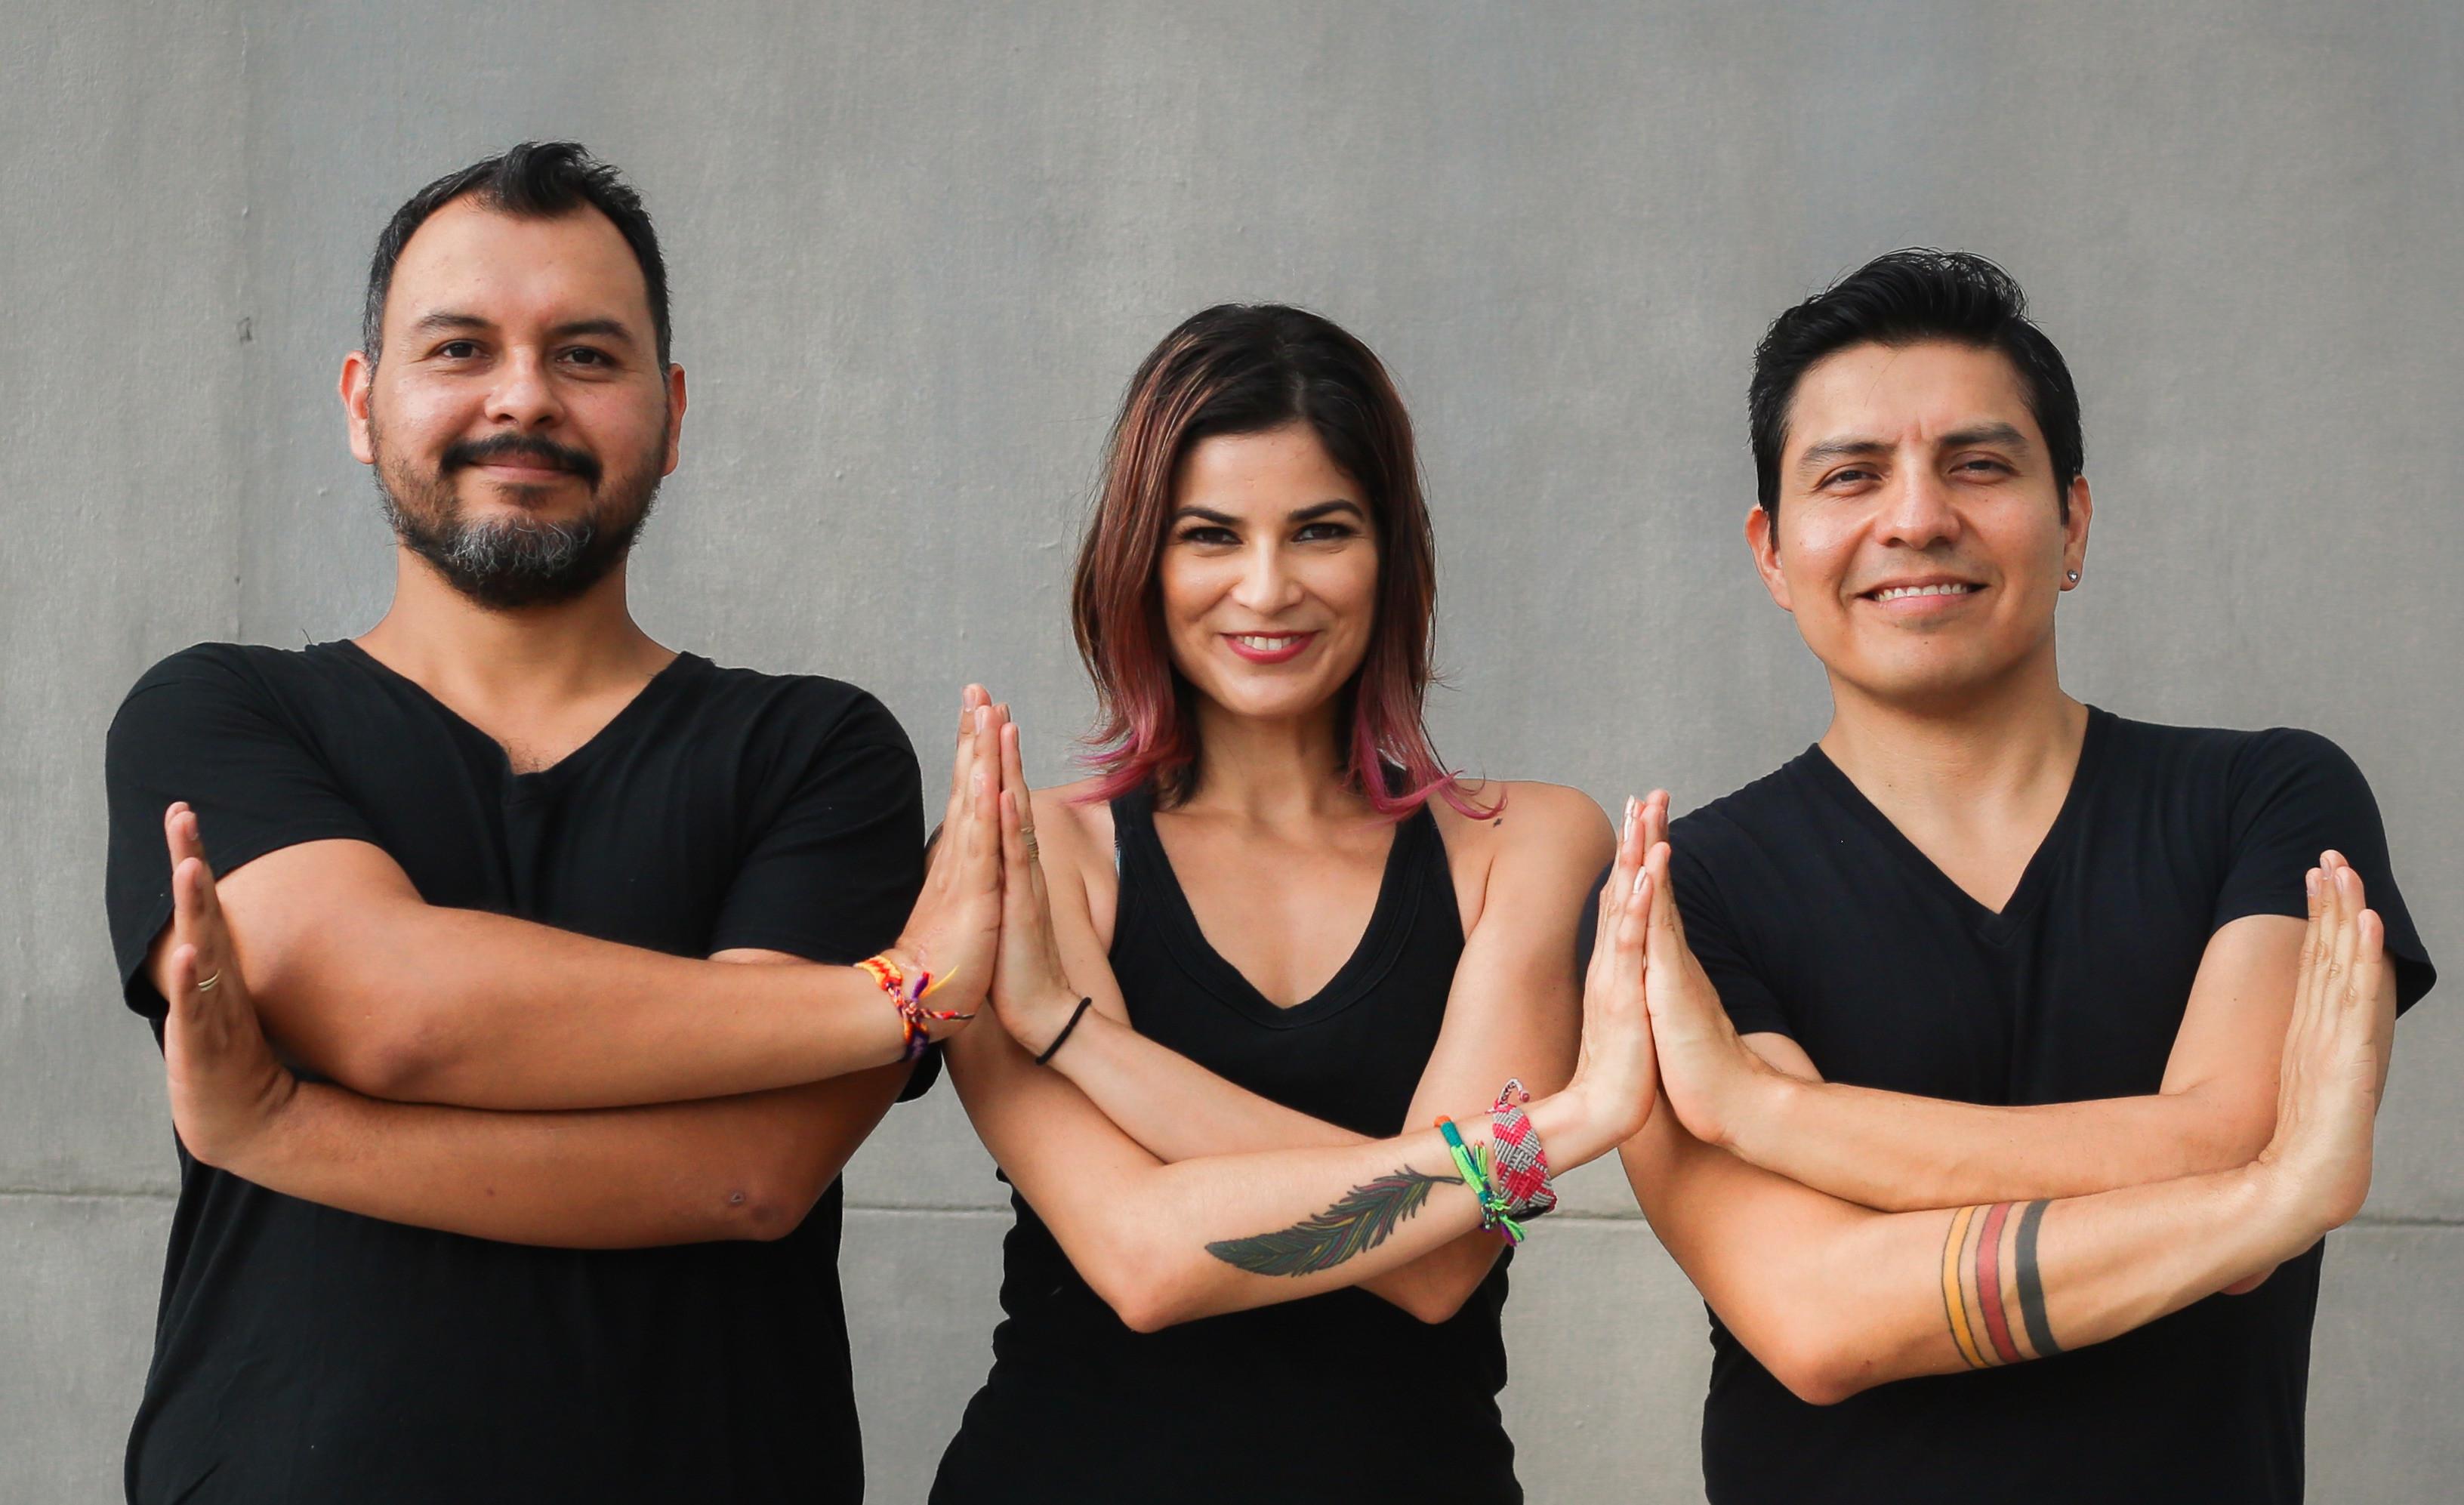 Diplomado en Filosofía de Yoga | Sādhak® Yoga Institute